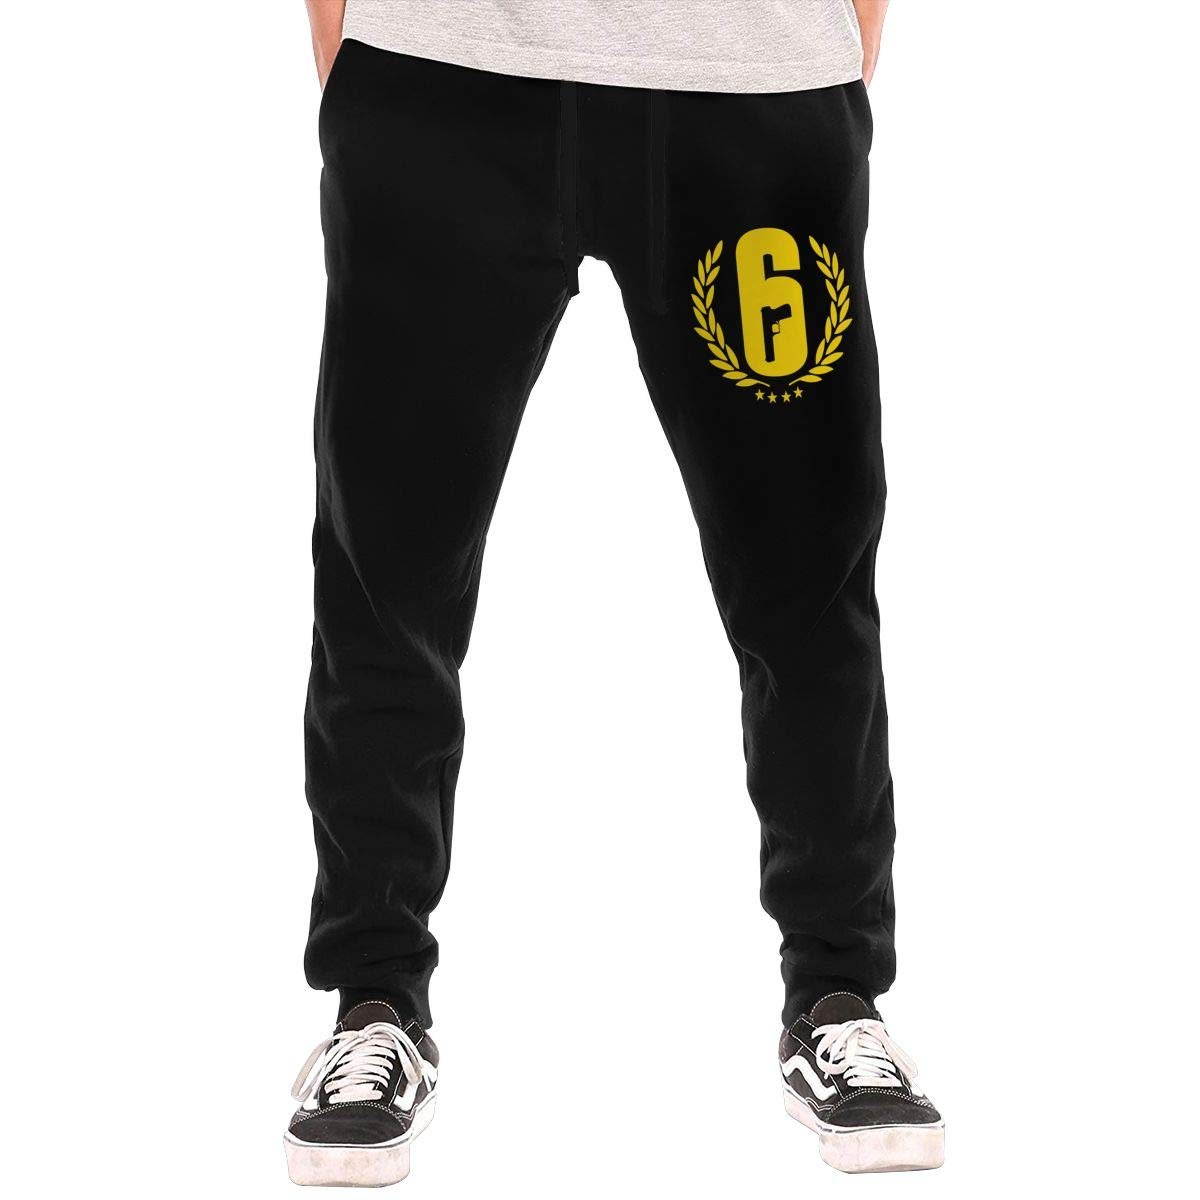 NEST-Homer Men's Sweatpants Rainbow Six Siege Logo Athletic Jogger Long Pants Black